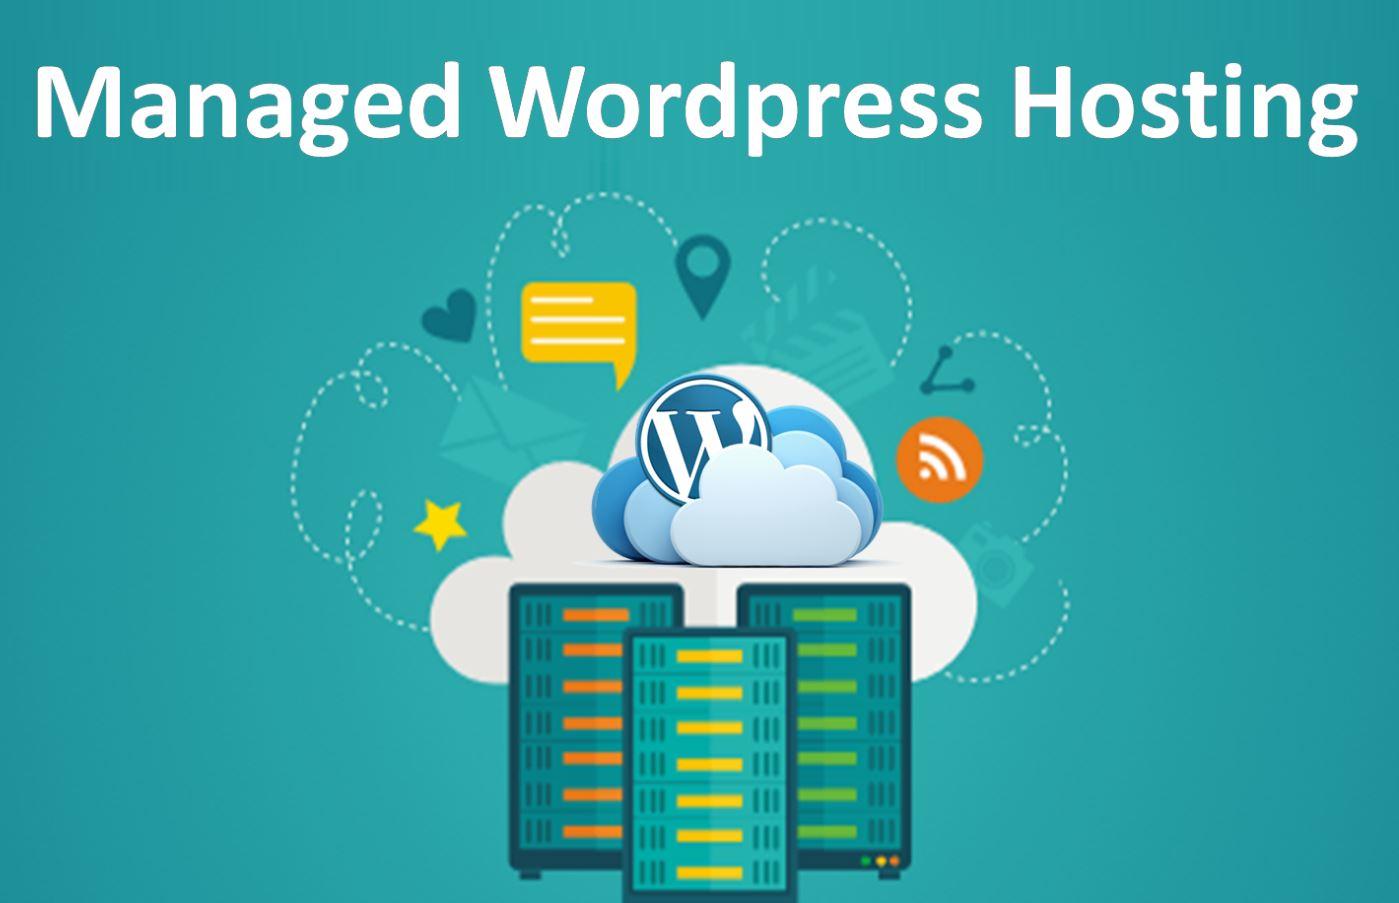 Few Reasons to Choose the Managed WordPress Hosting